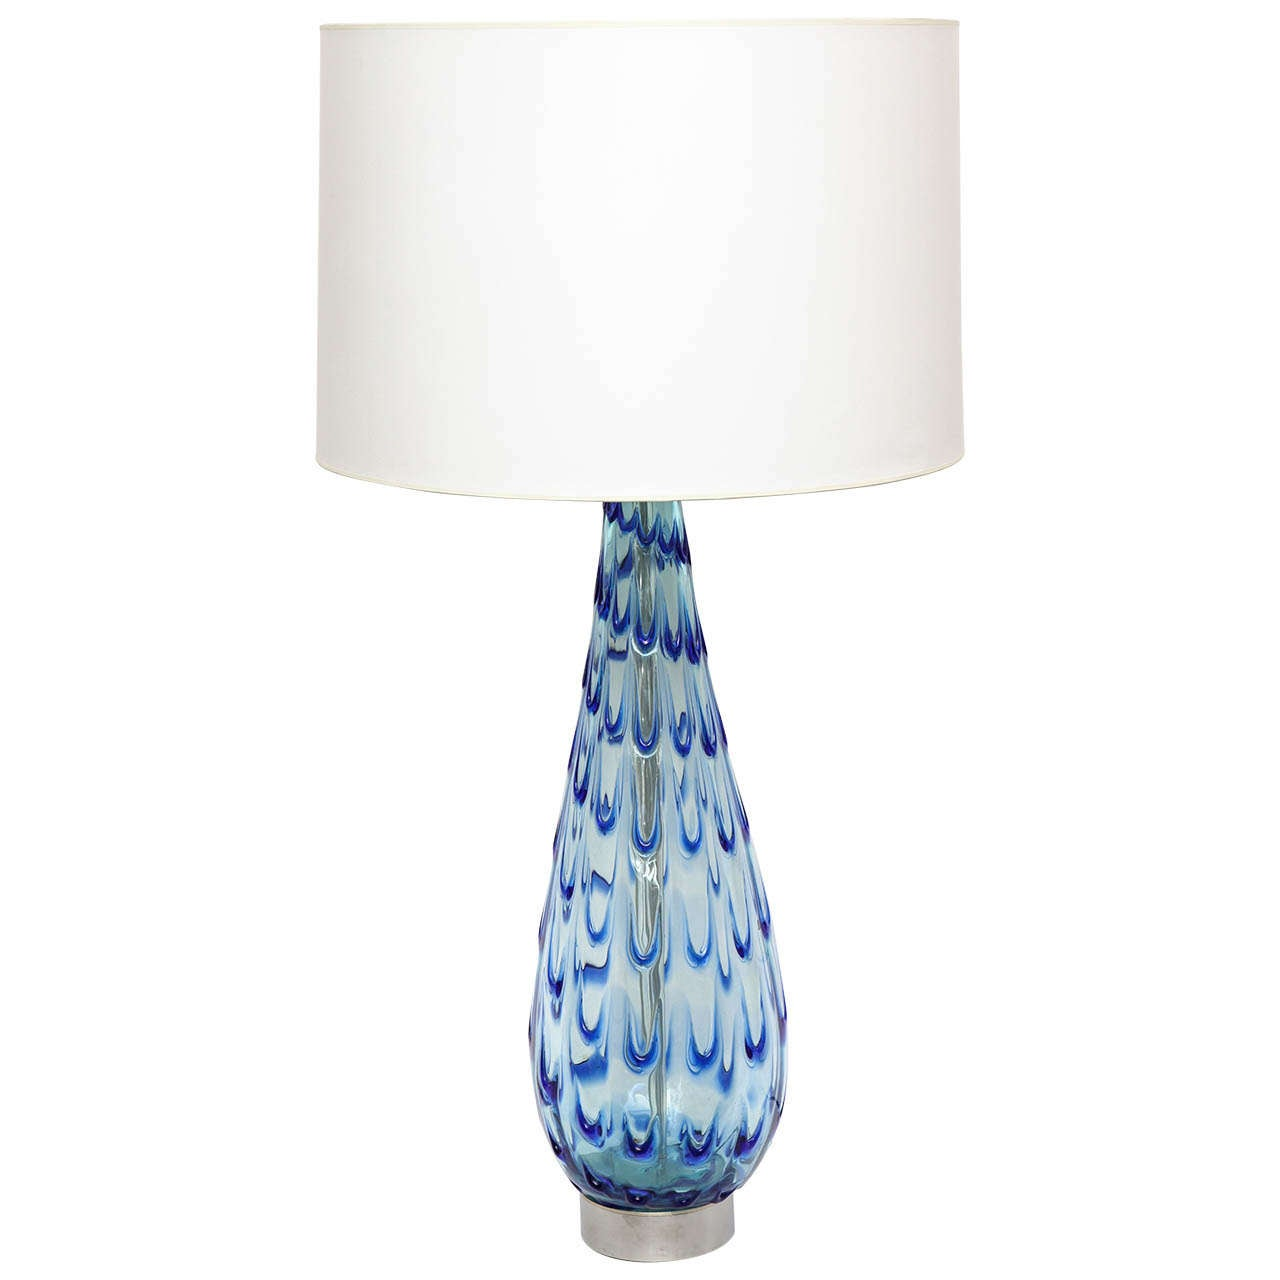 1950s Italian Art Glass Table Lamp